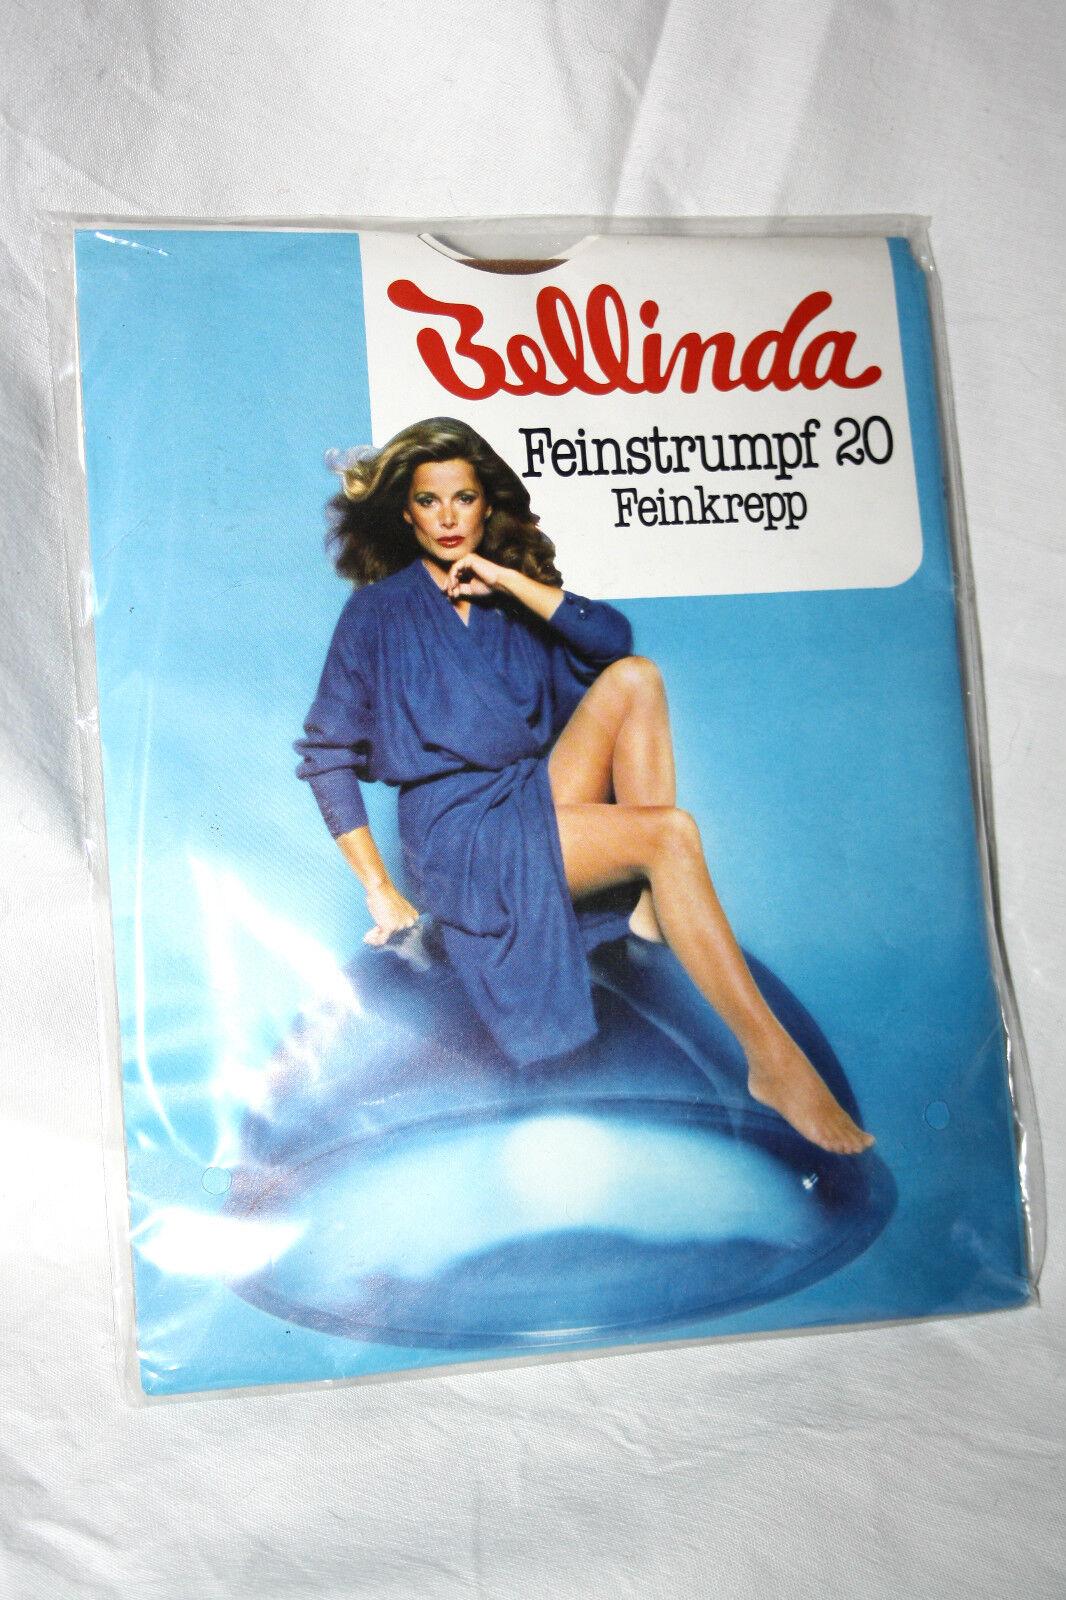 Bellinda Nylon Bas pin-up taille 9 Diamant 20 les chaussettes nylon straps nylon chaussettes Chaussettes 3baf5d